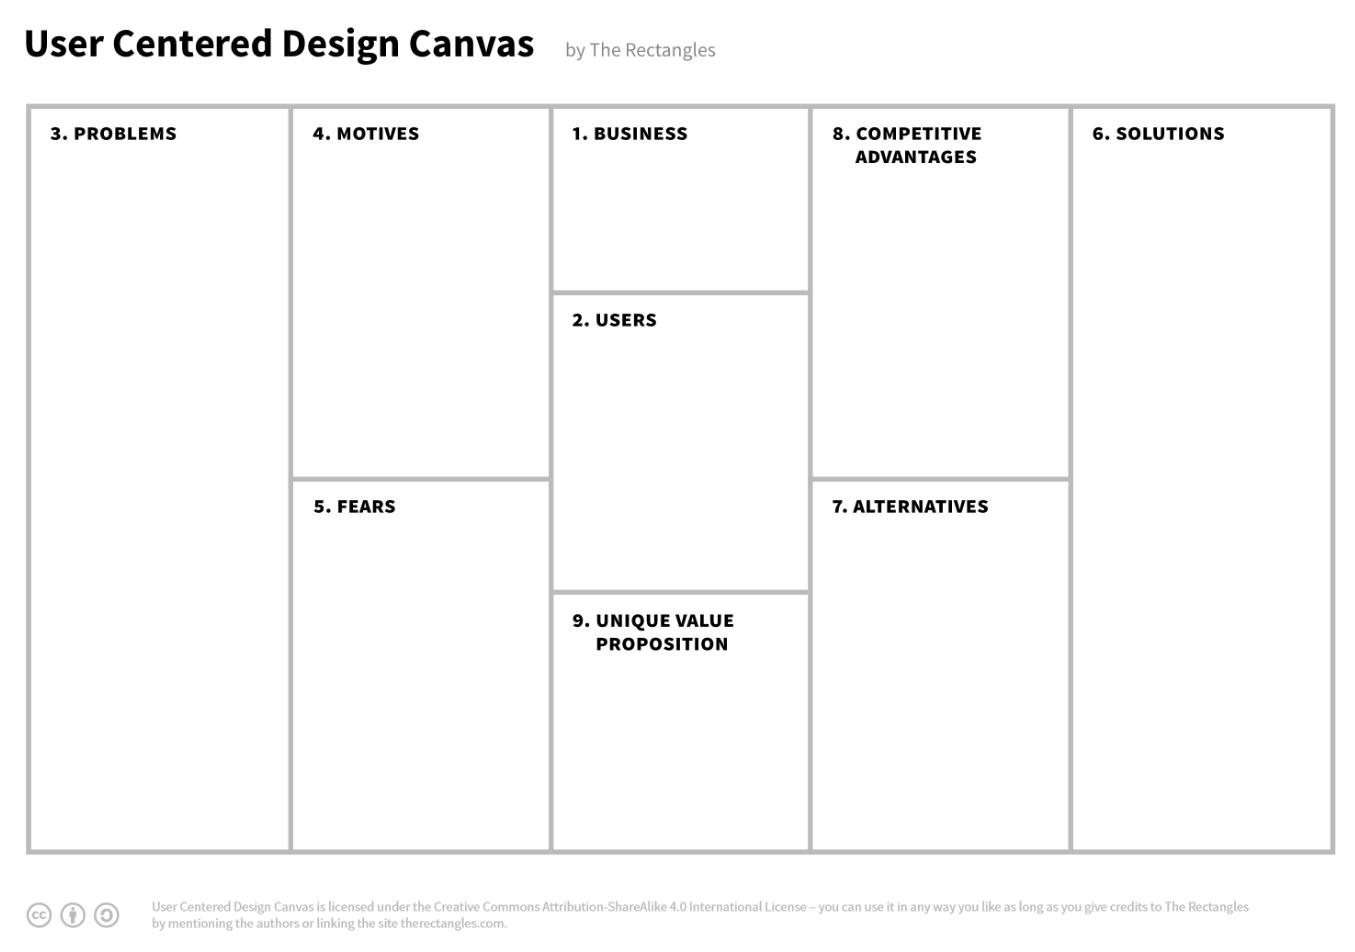 User Centred Design Canvas